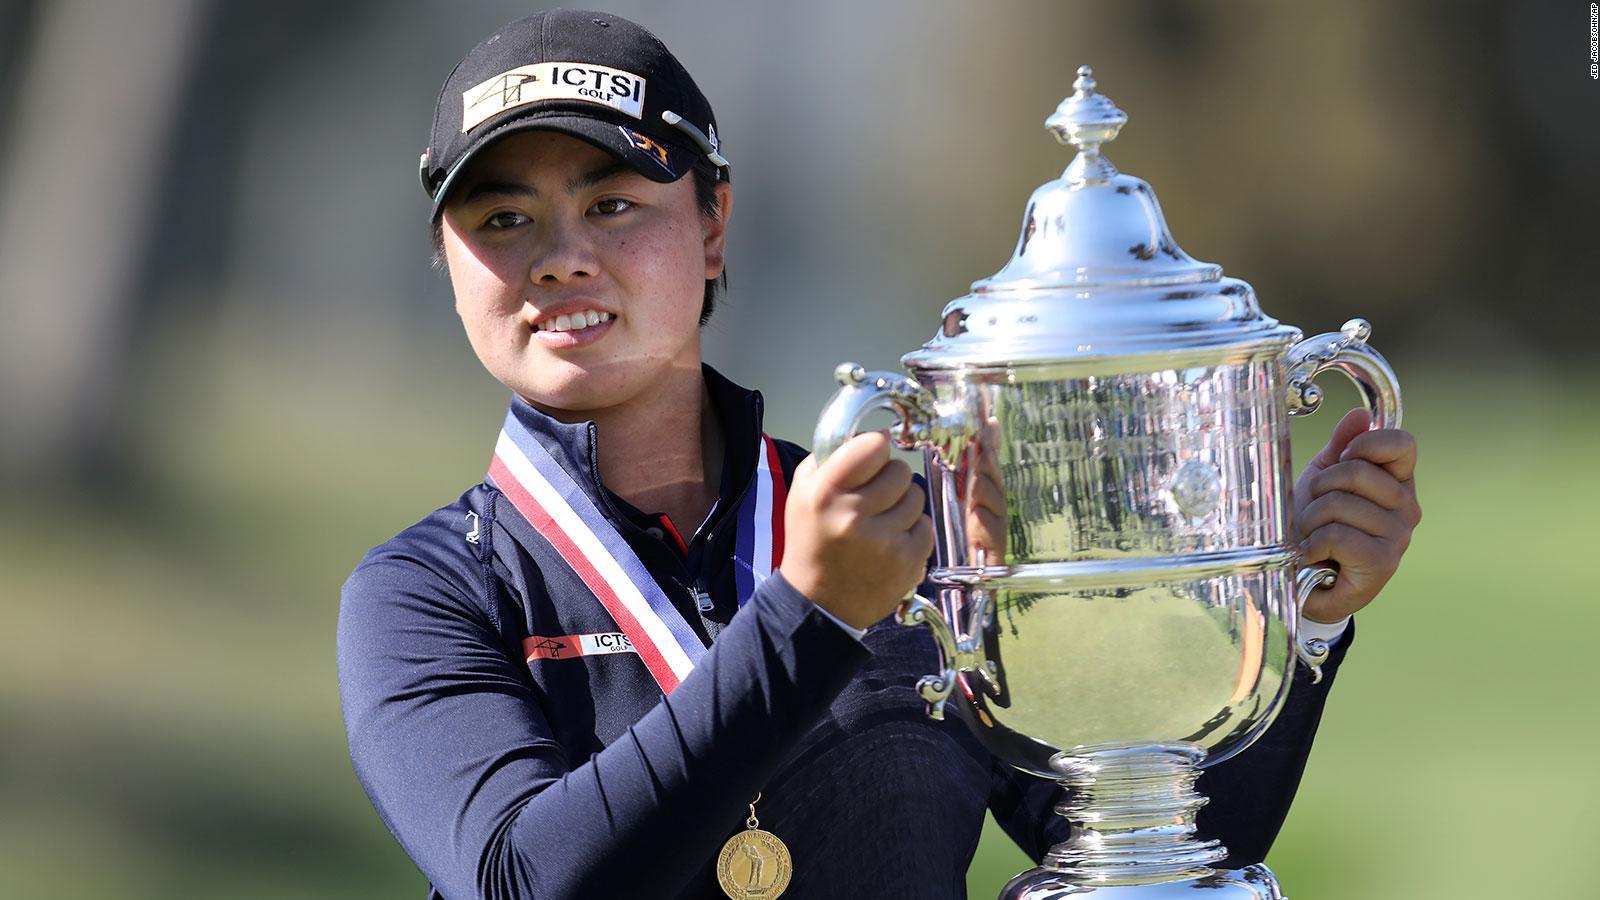 Yuka Saso Wins 2021 Us Women S Open Becomes First Filipino Player To Win A Golf Major Tournament Cnn